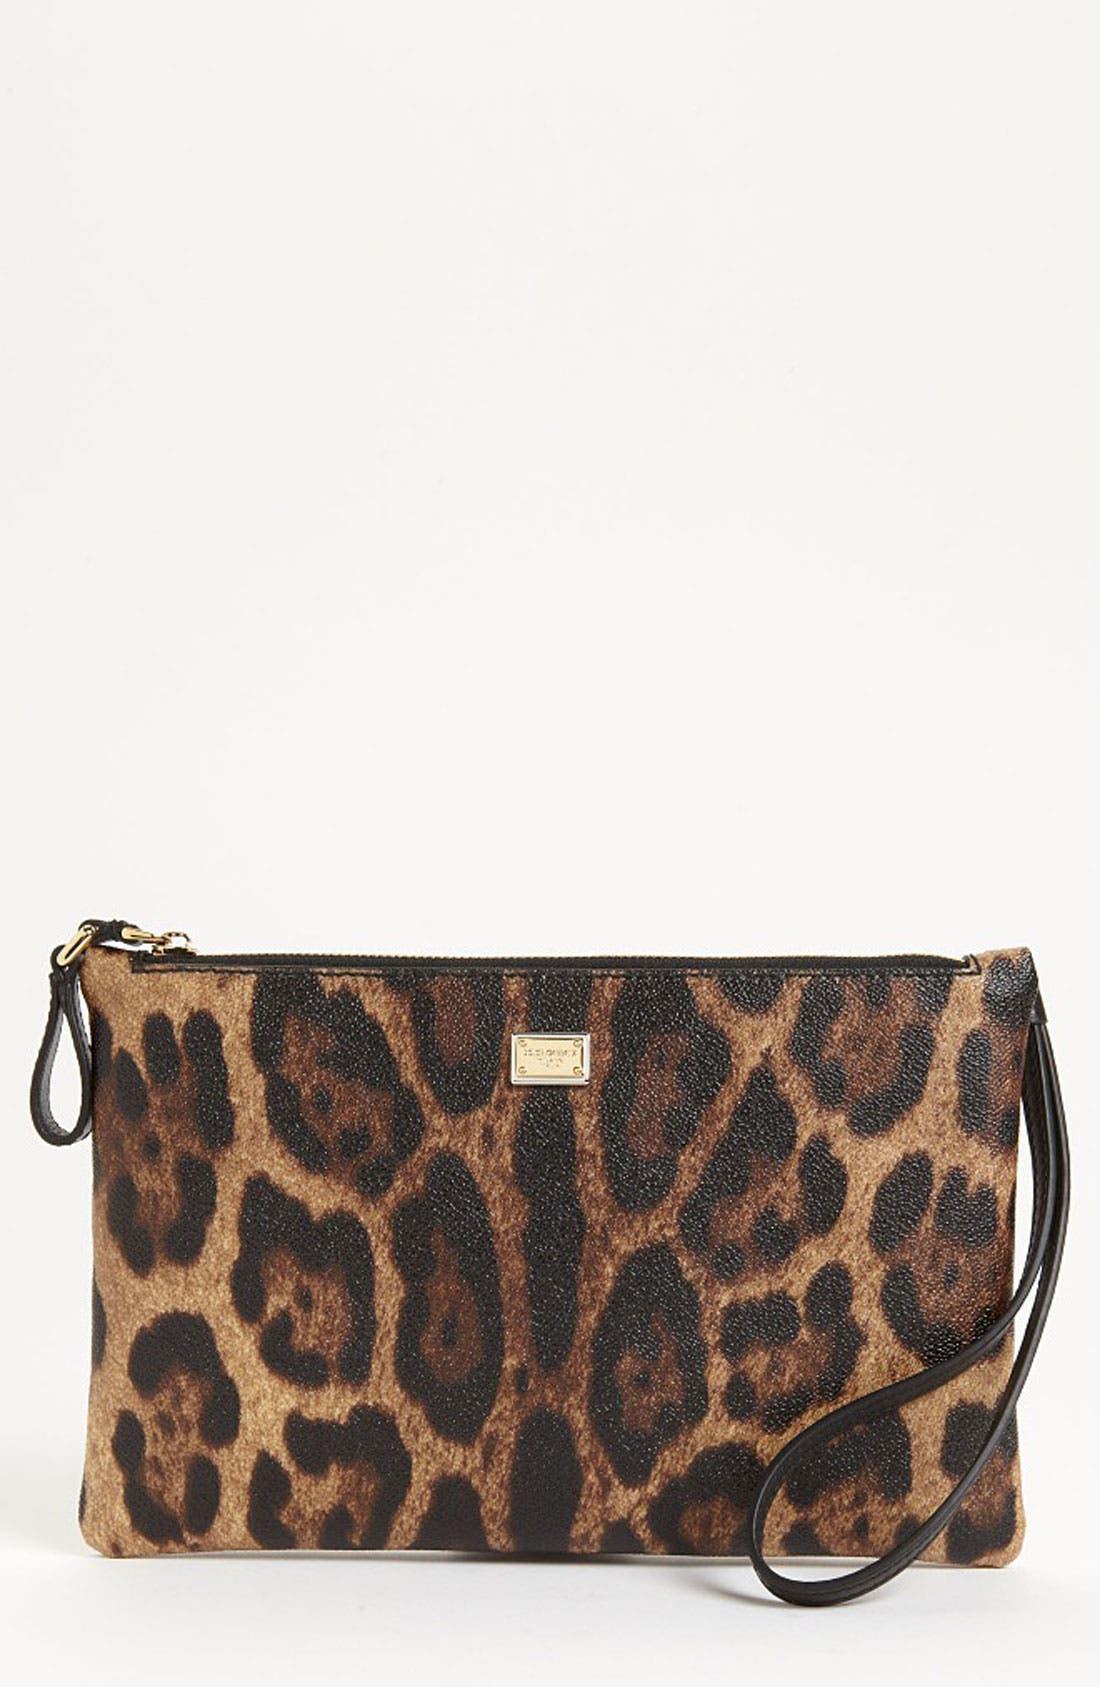 Main Image - Dolce&Gabbana 'Miss Cleo' Wristlet